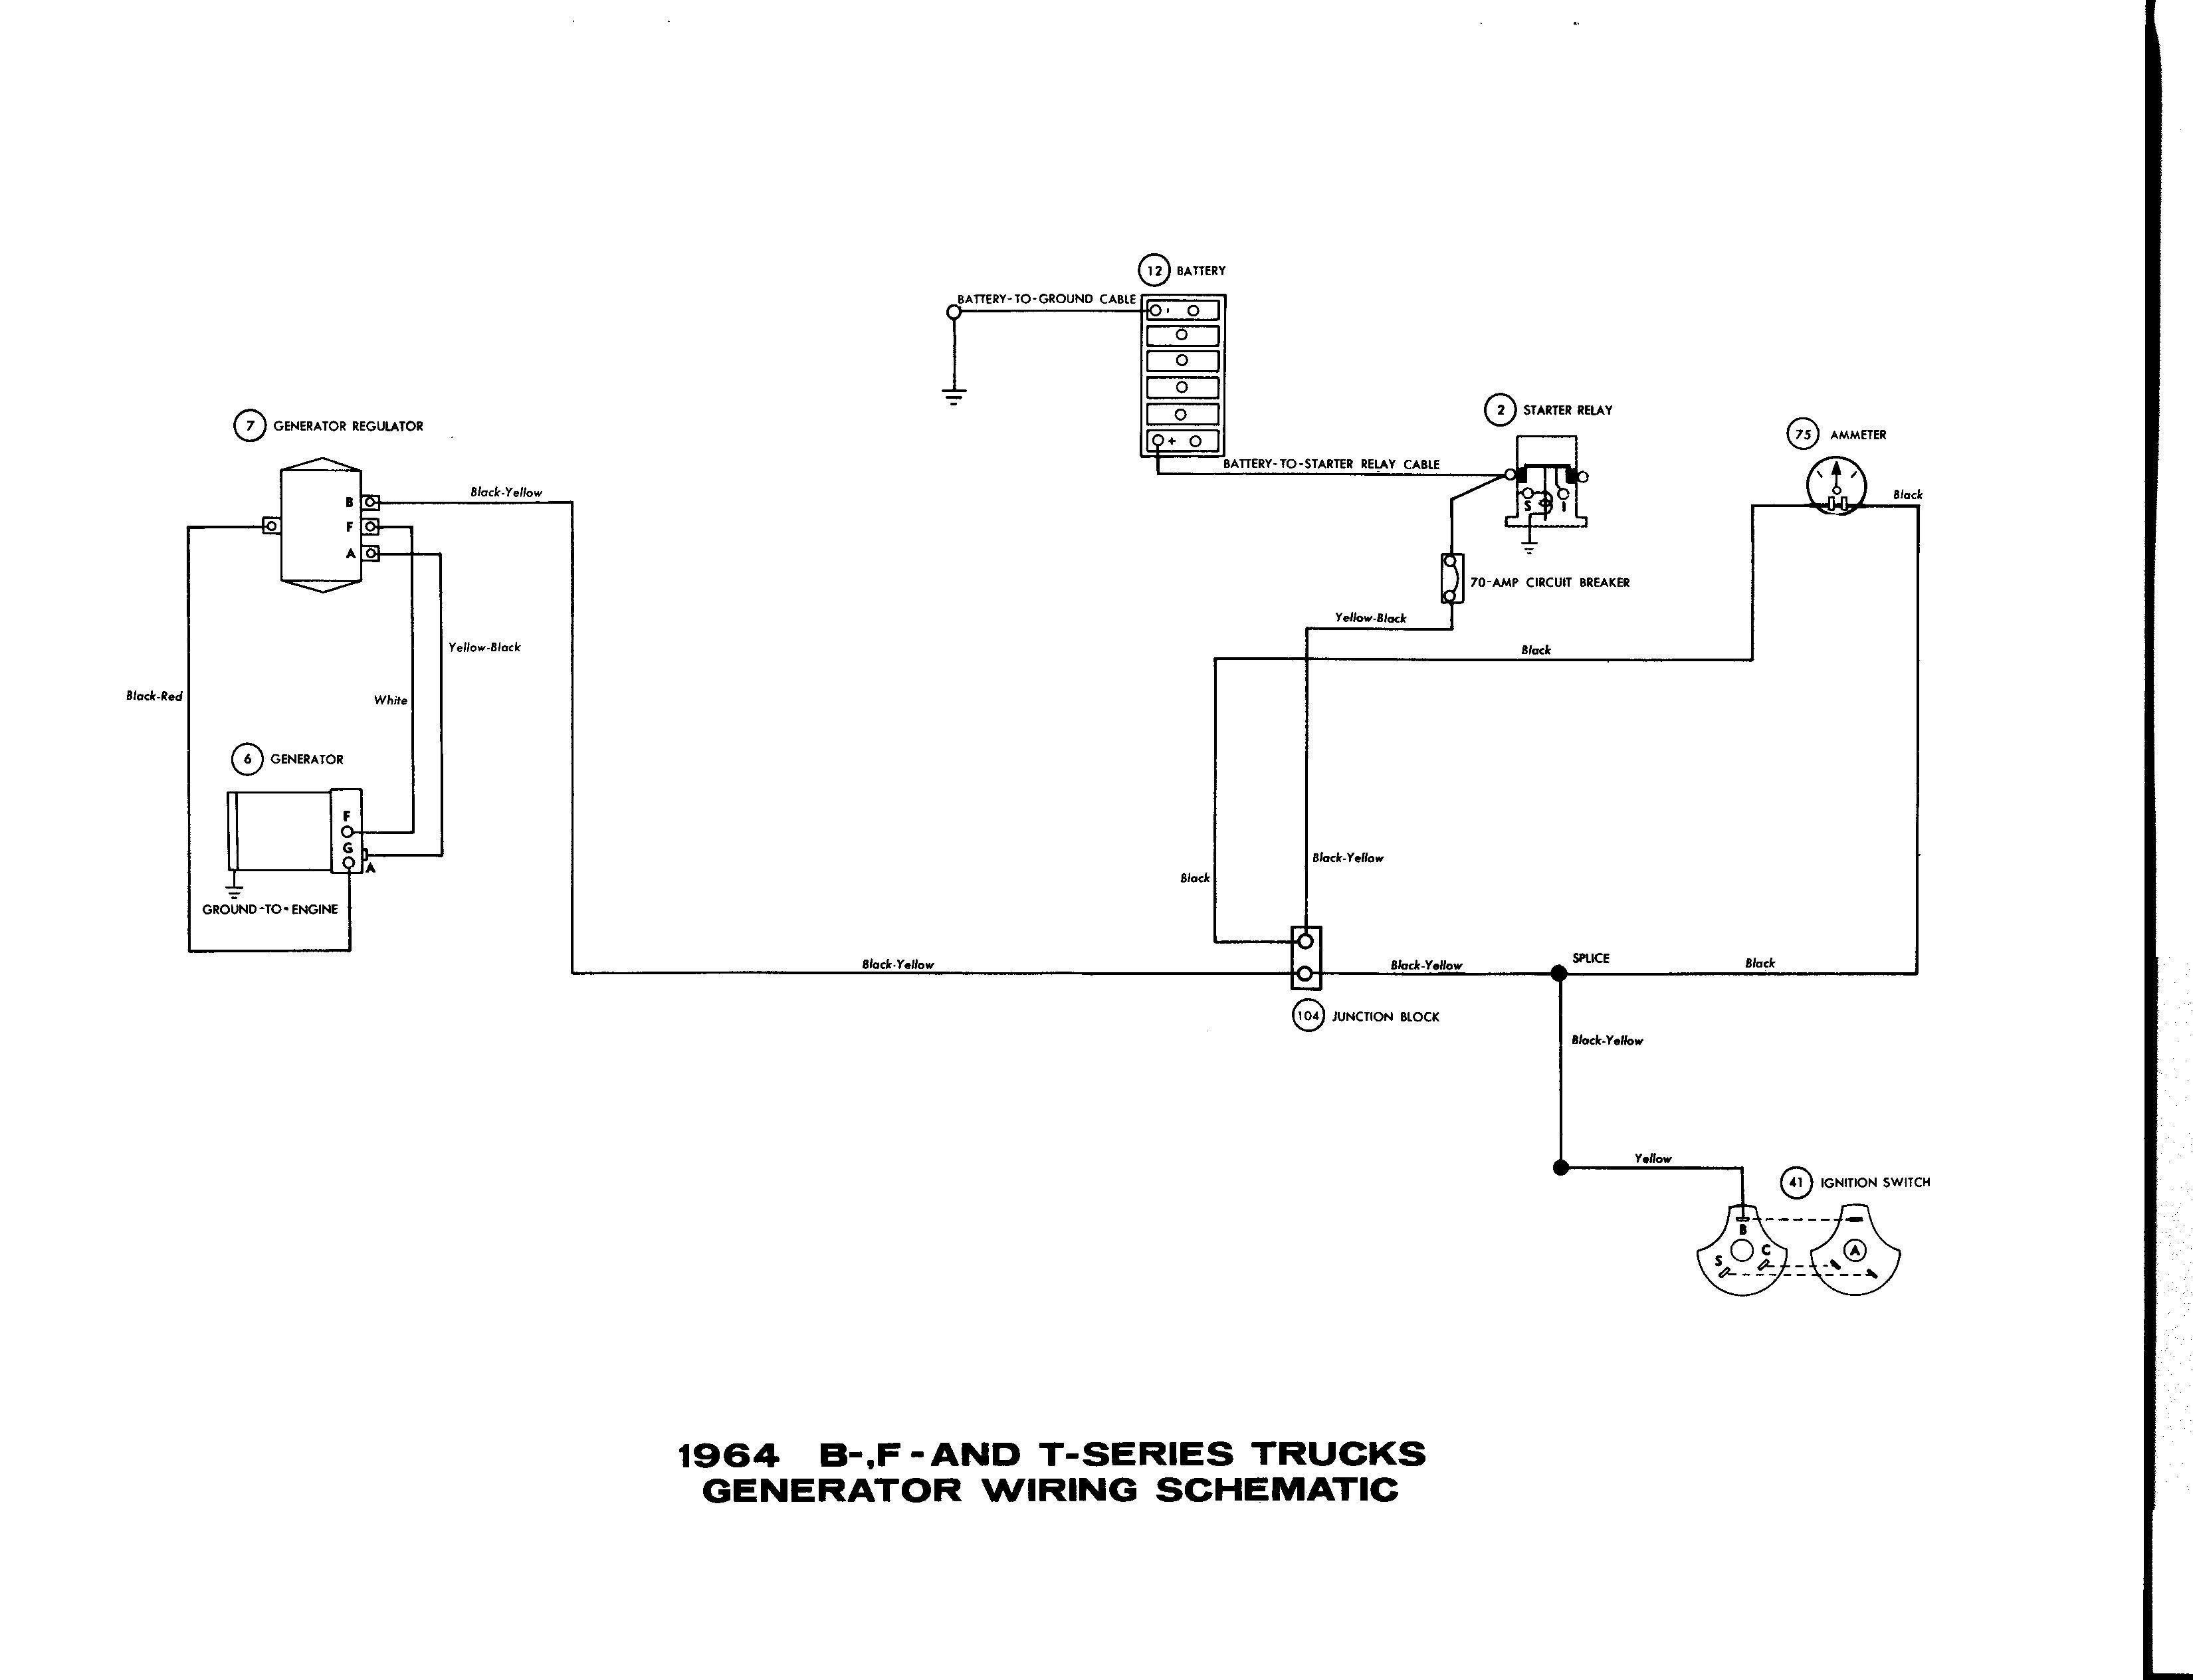 Unique Marelli Generator Wiring Diagram Diagram Diagramsample Diagramtemplate Wiringdiagram Diagramchart Worksheet Work Diagram Alternator Diagram Chart